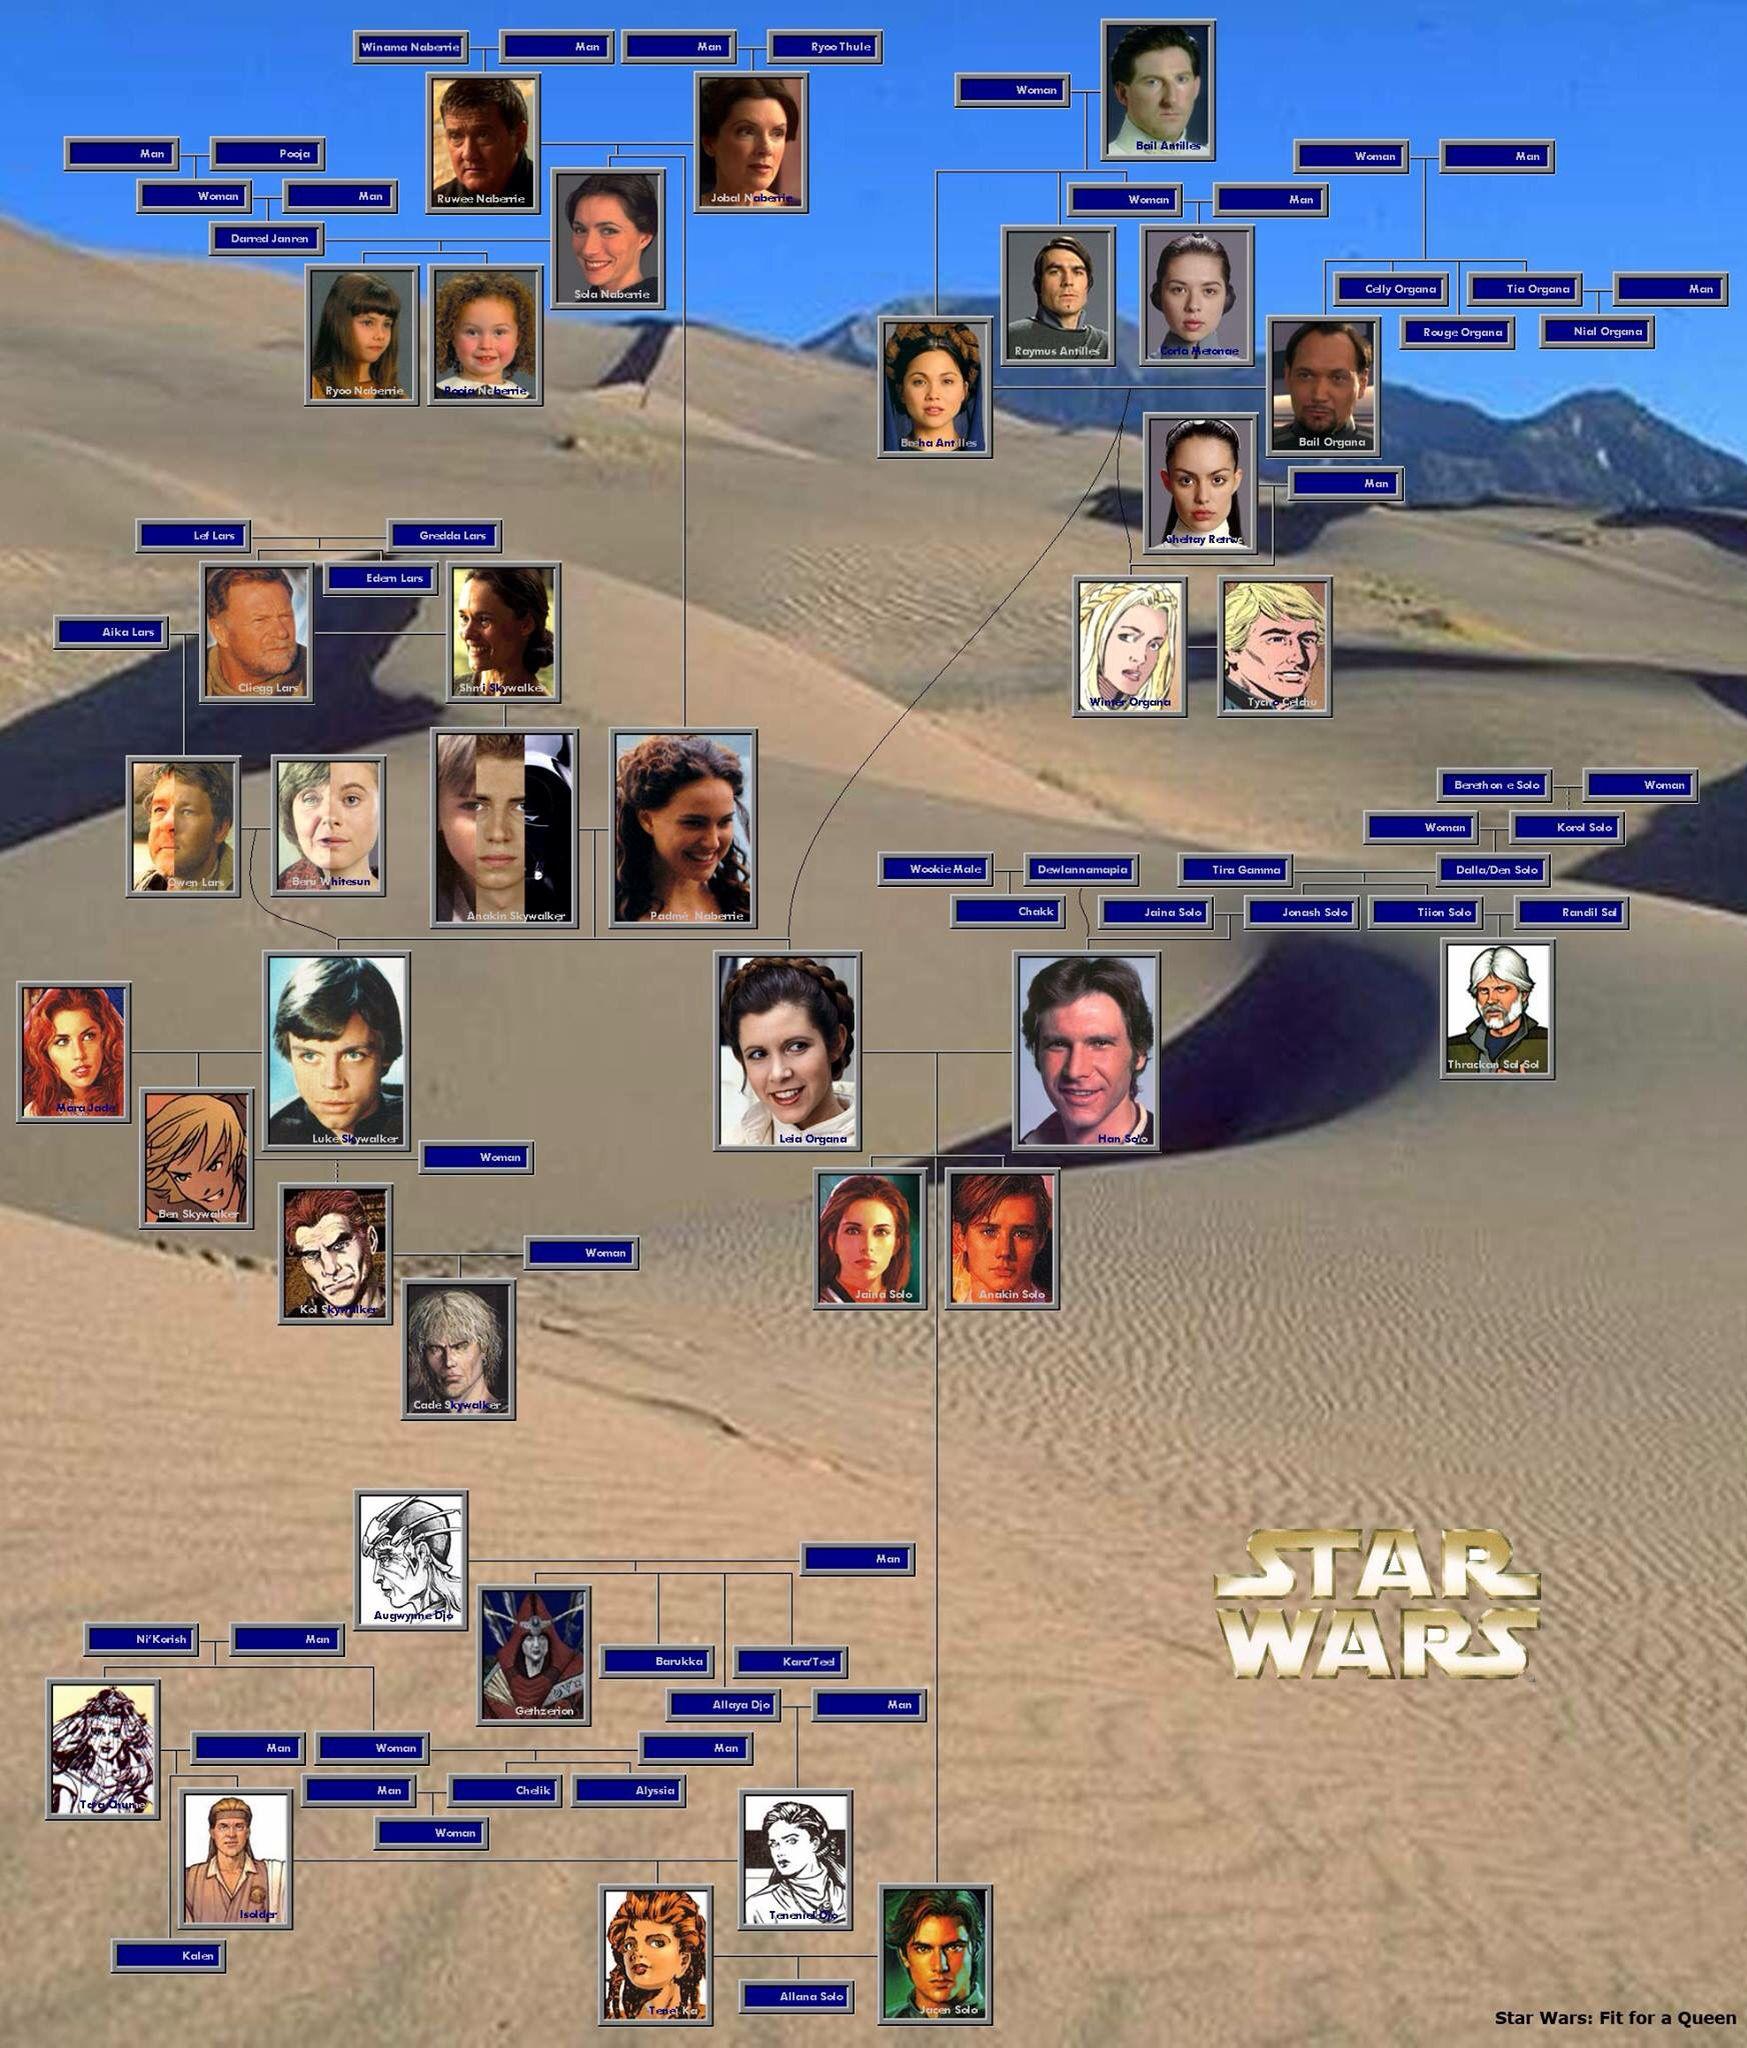 Star wars family tree star wars pinterest star wars for Arbol genealogico star wars